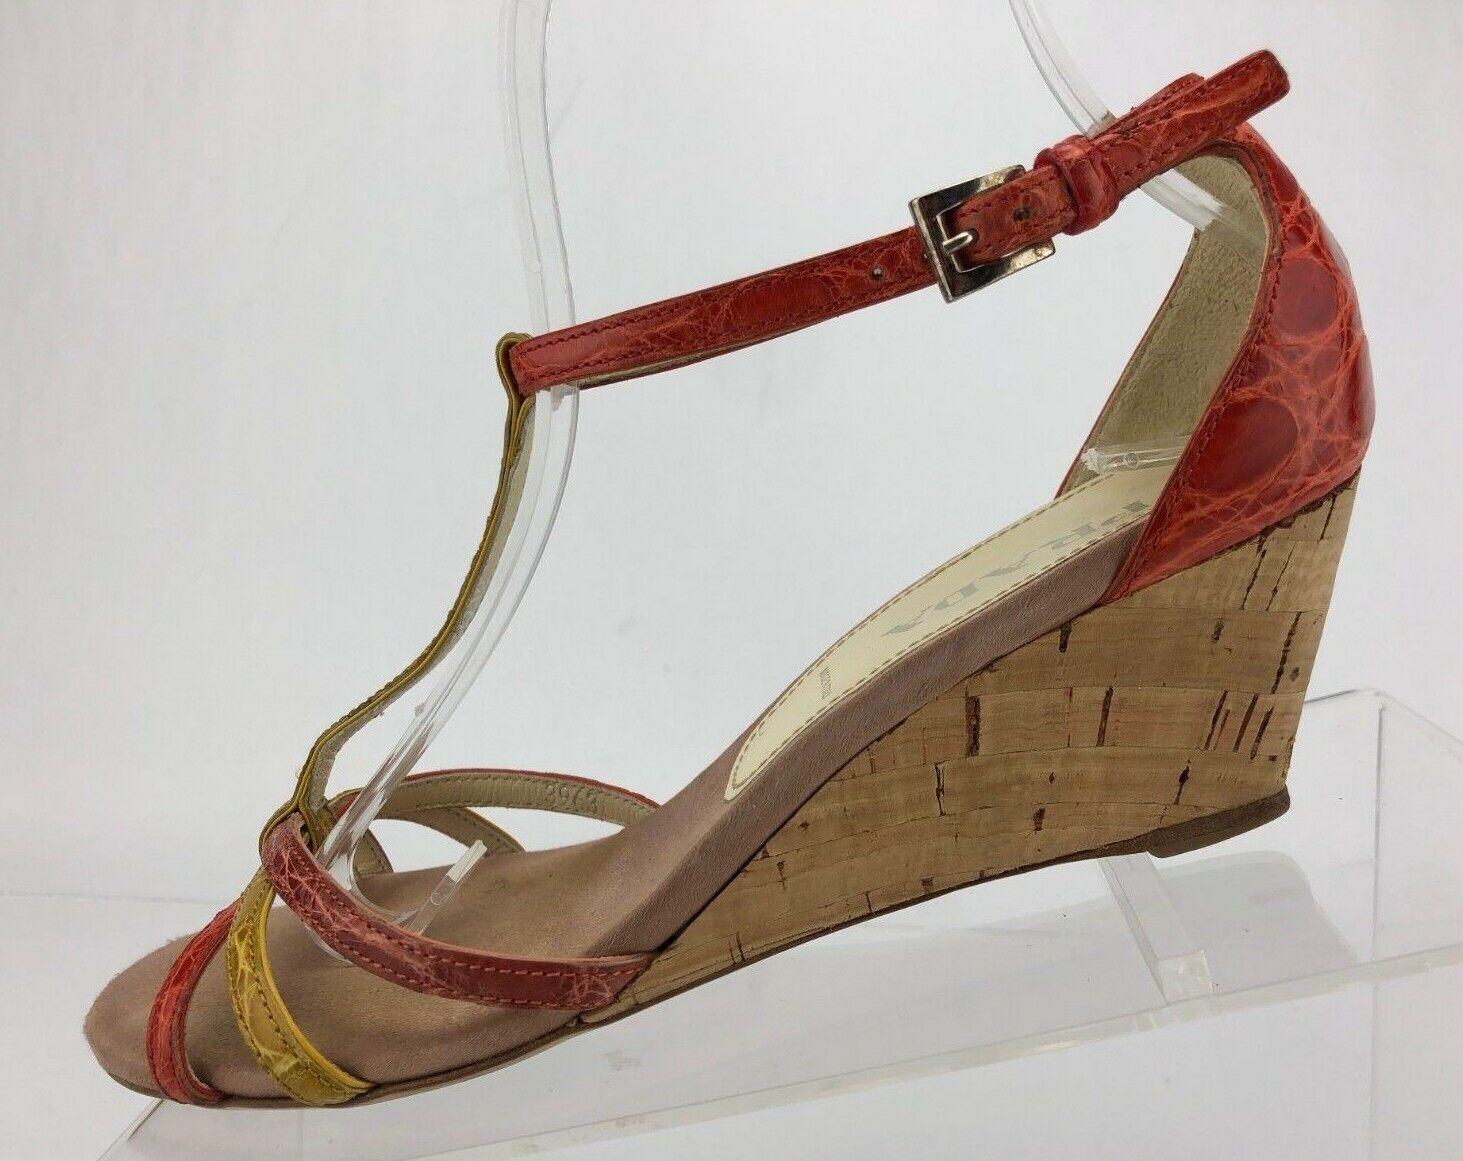 Prada T Strap Croc Skin Wedge Sandals Closed Back  Womens 36.5 6 6.5 US